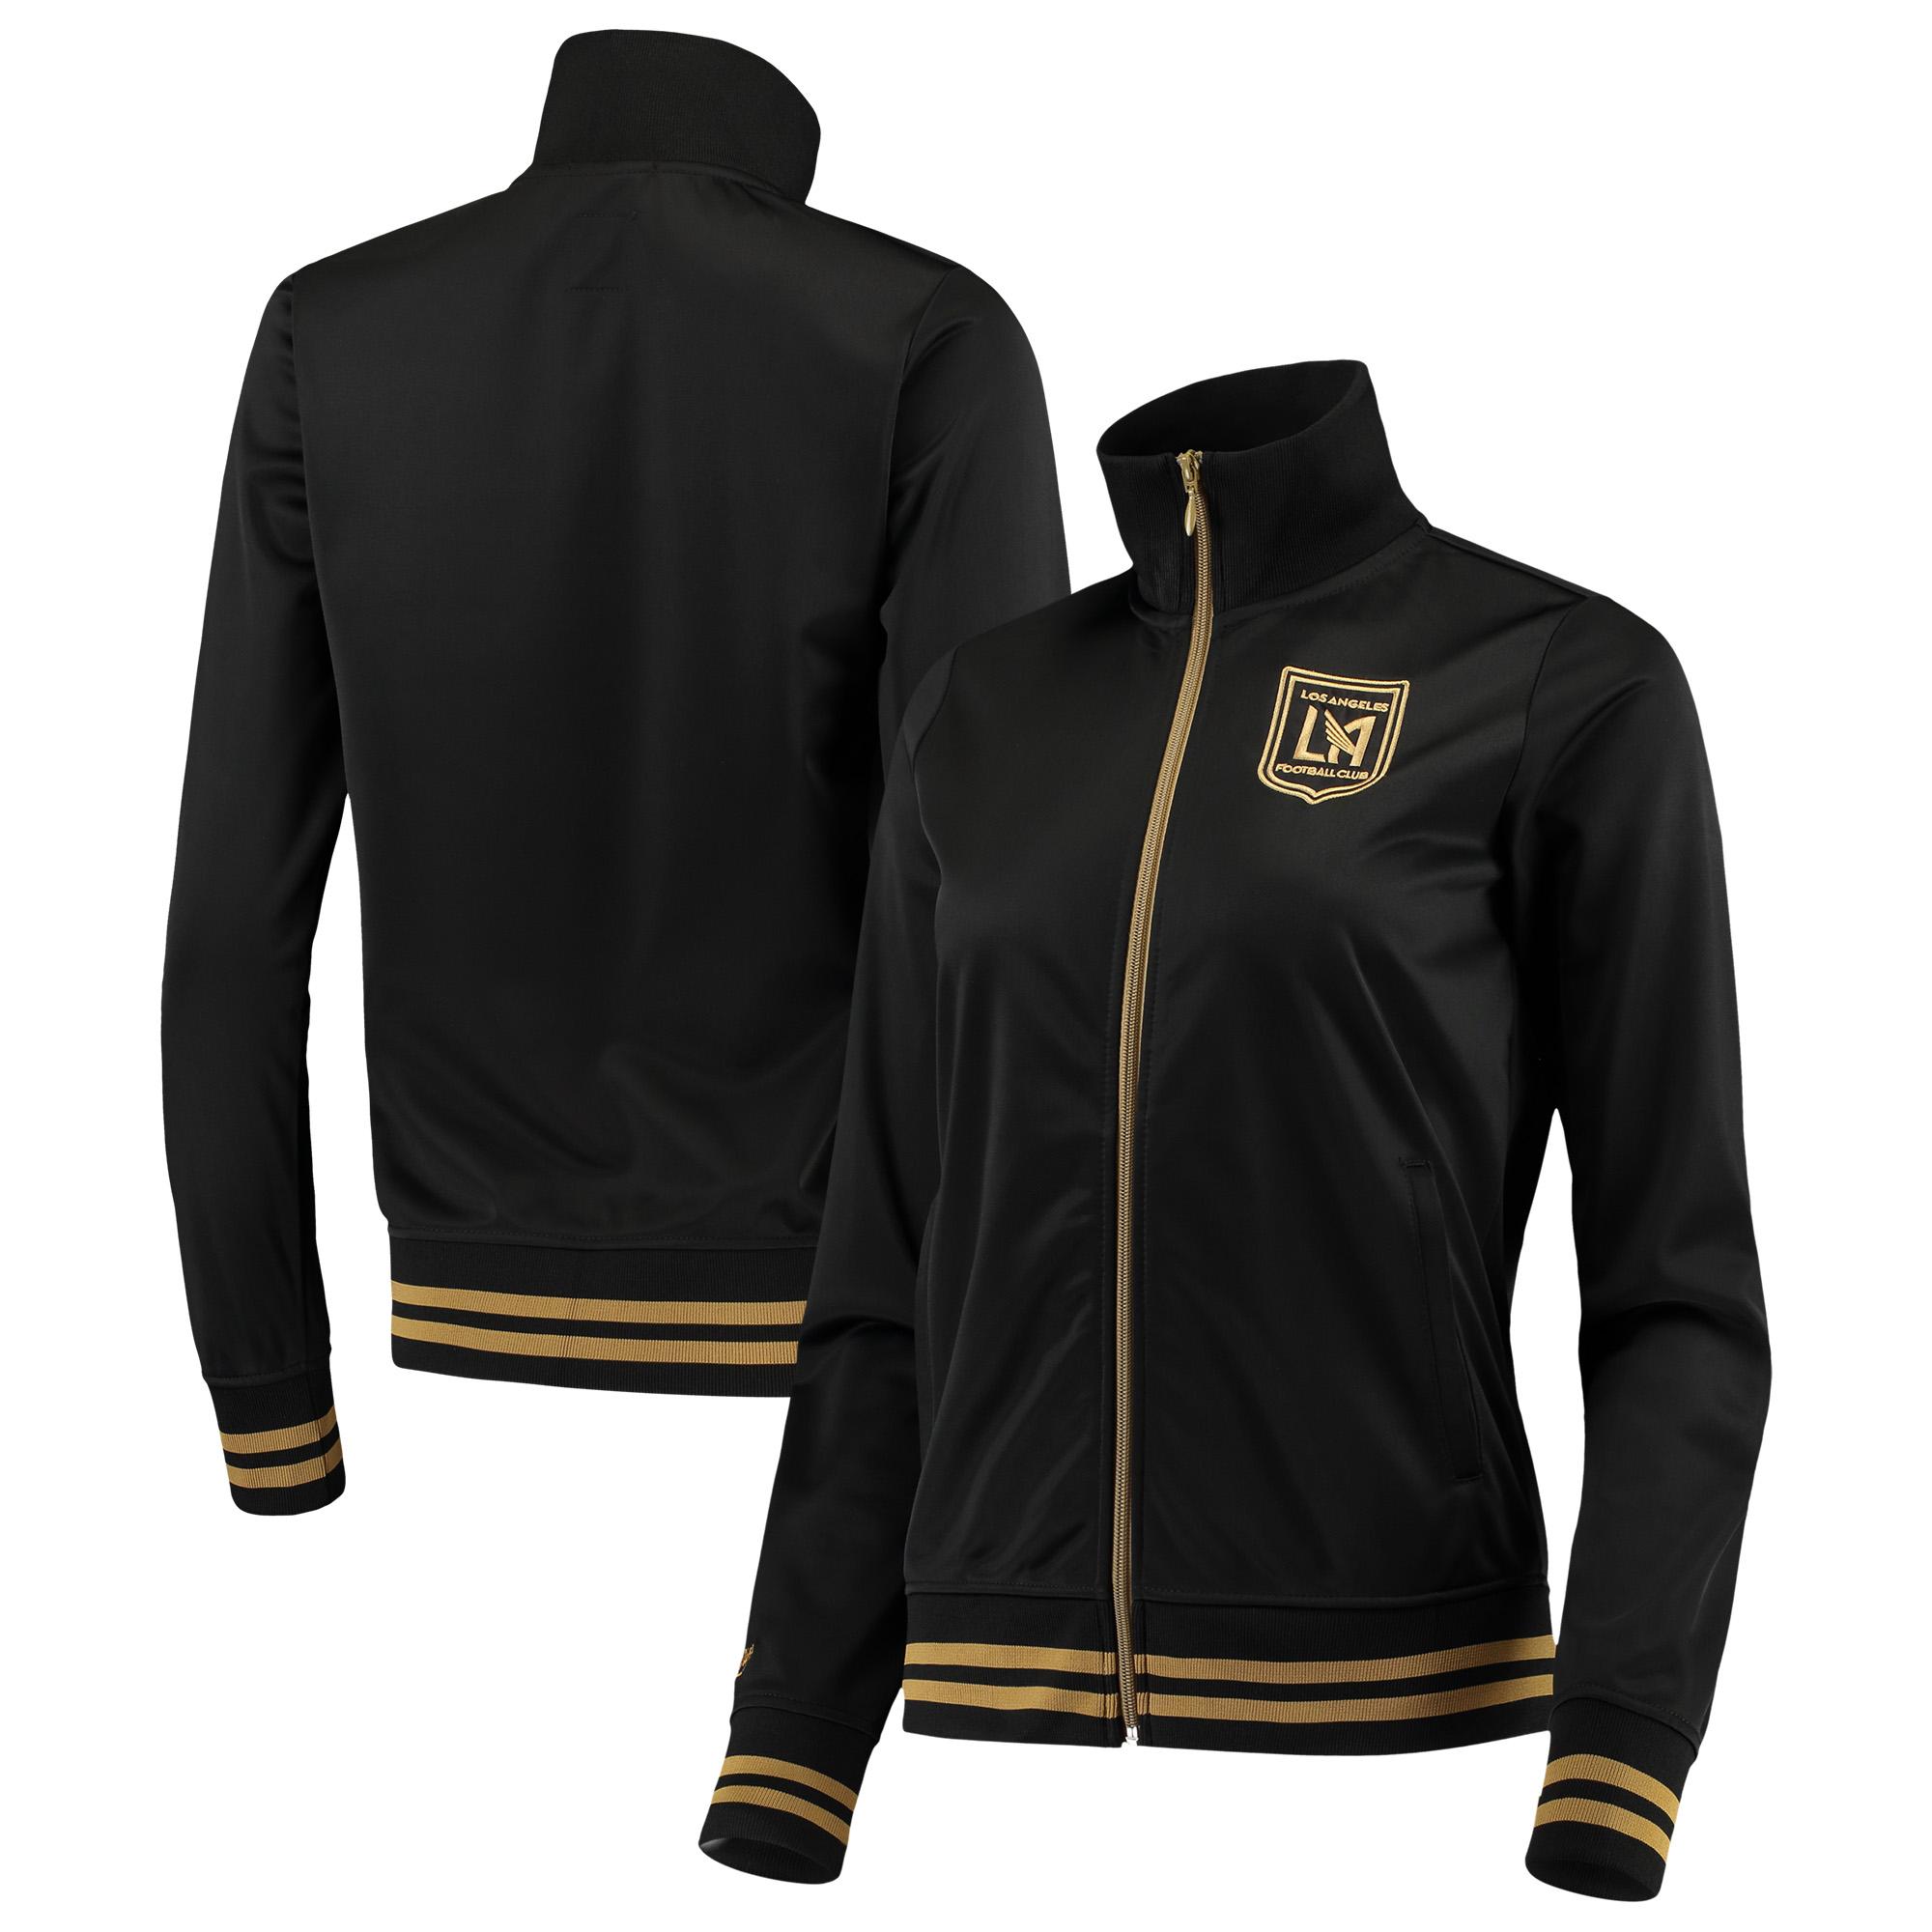 LAFC Mitchell & Ness Women's Full-Zip Track Jacket - Black